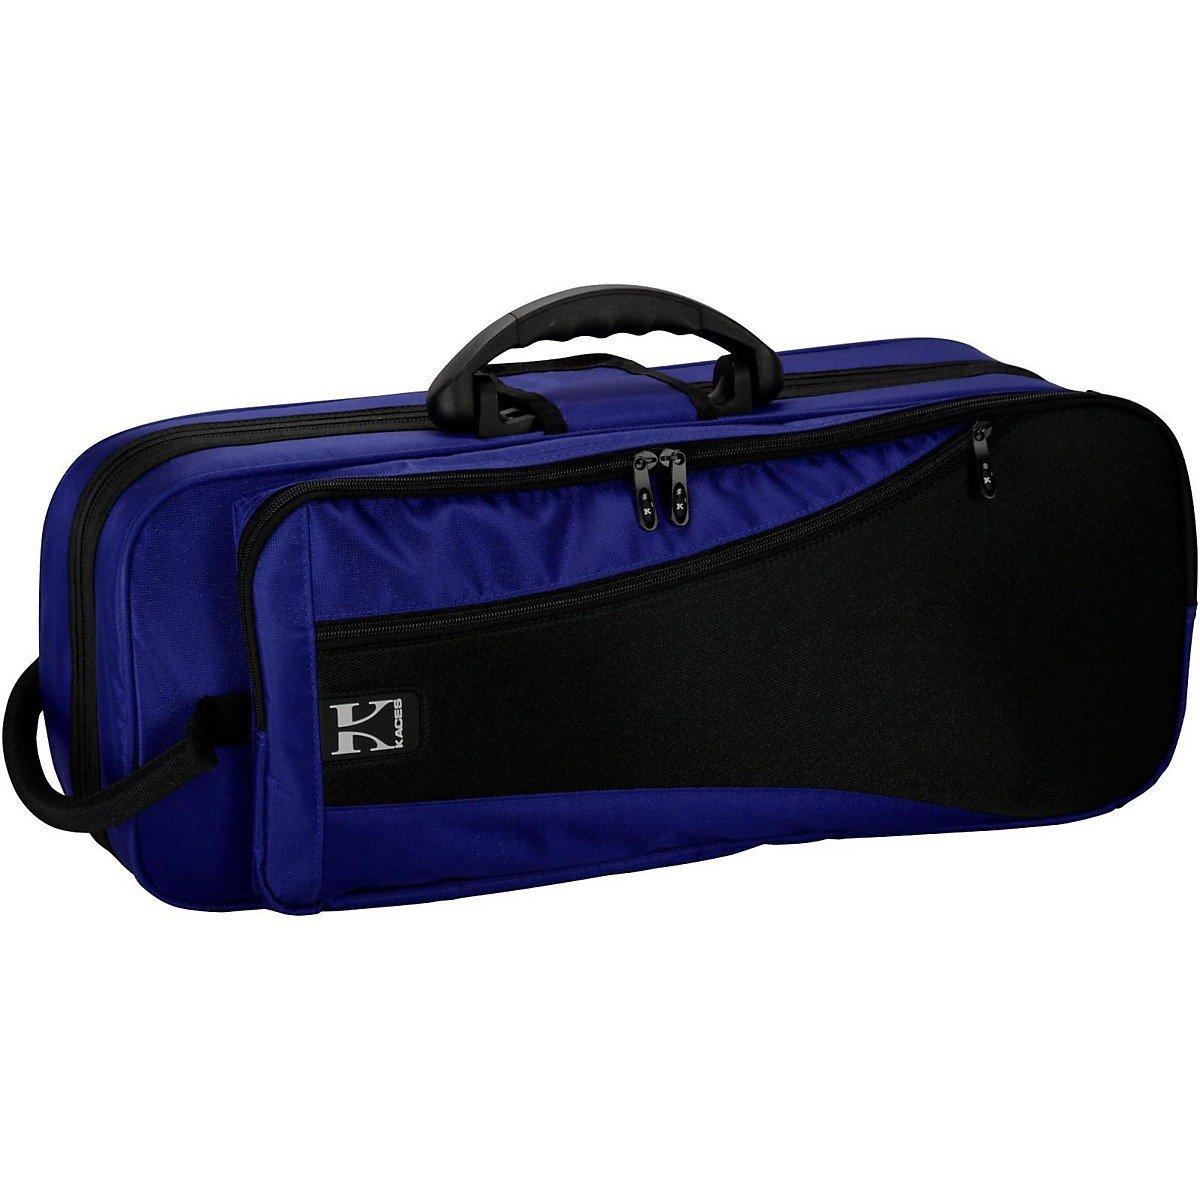 Kaces KBFB-TP2 Lightweight Hard-shell Trumpet Case, Dark Blue